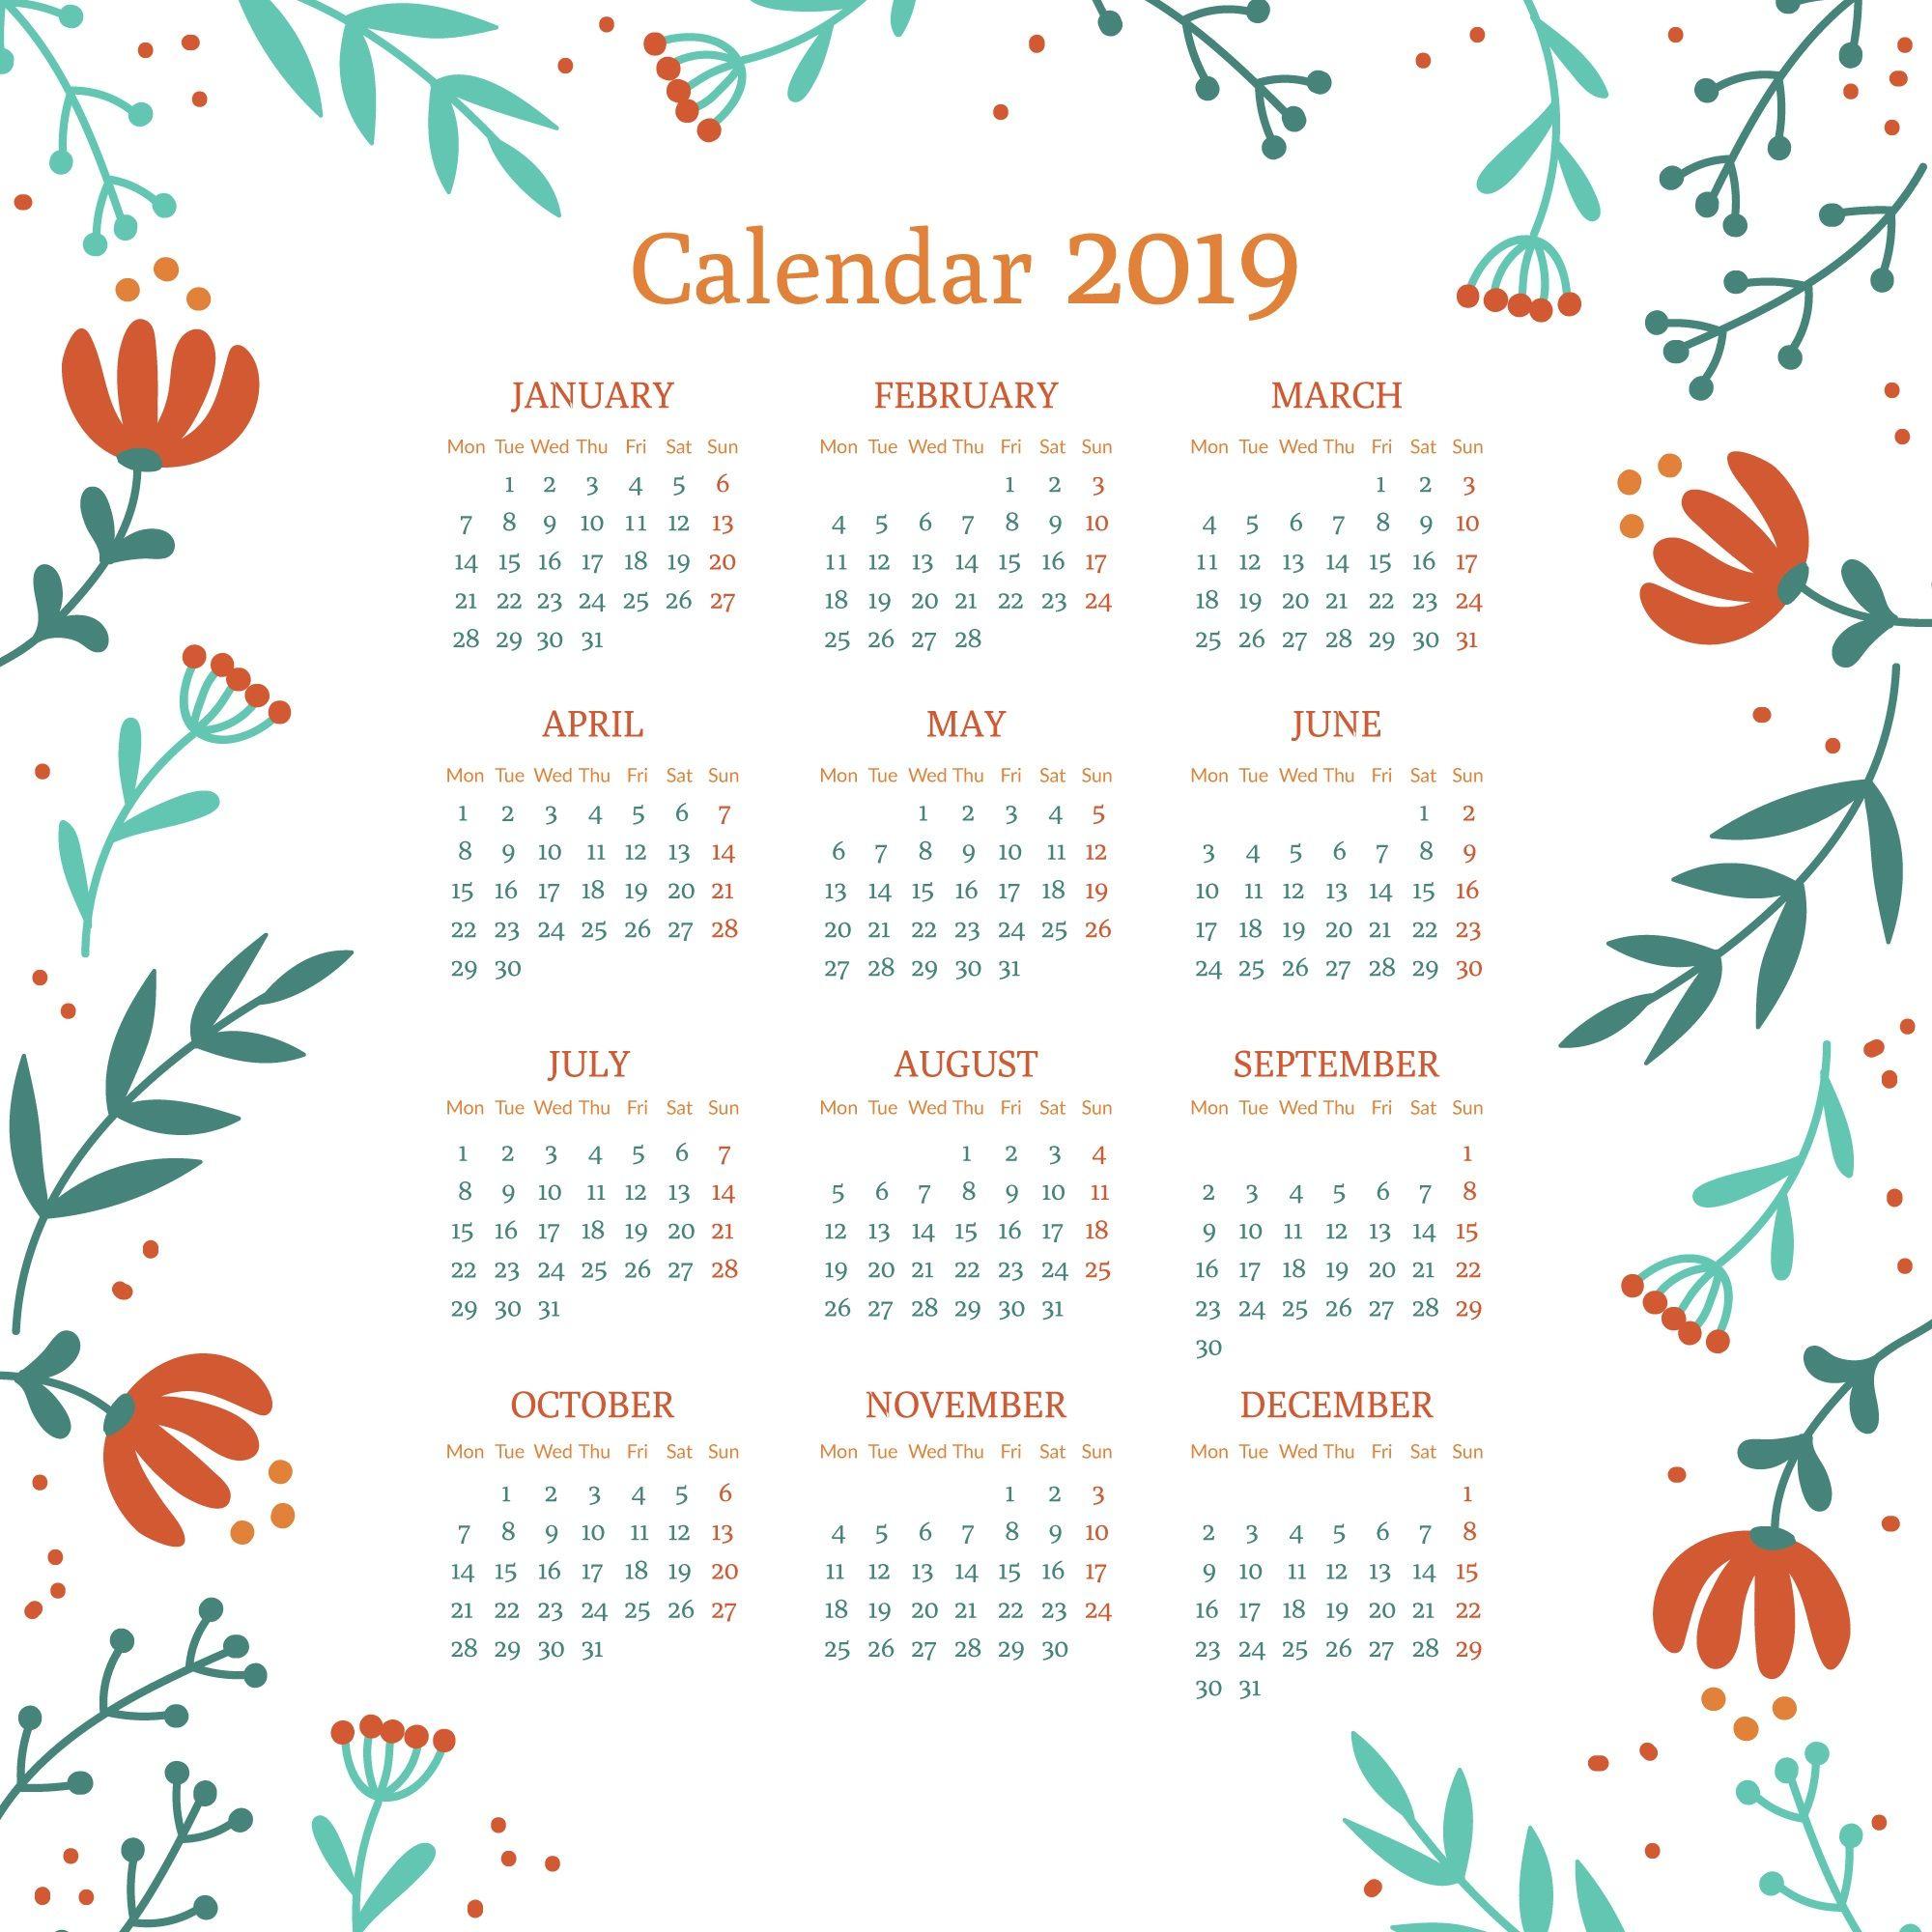 Calendar Printable 2019 Template Calendar 2019 Printable